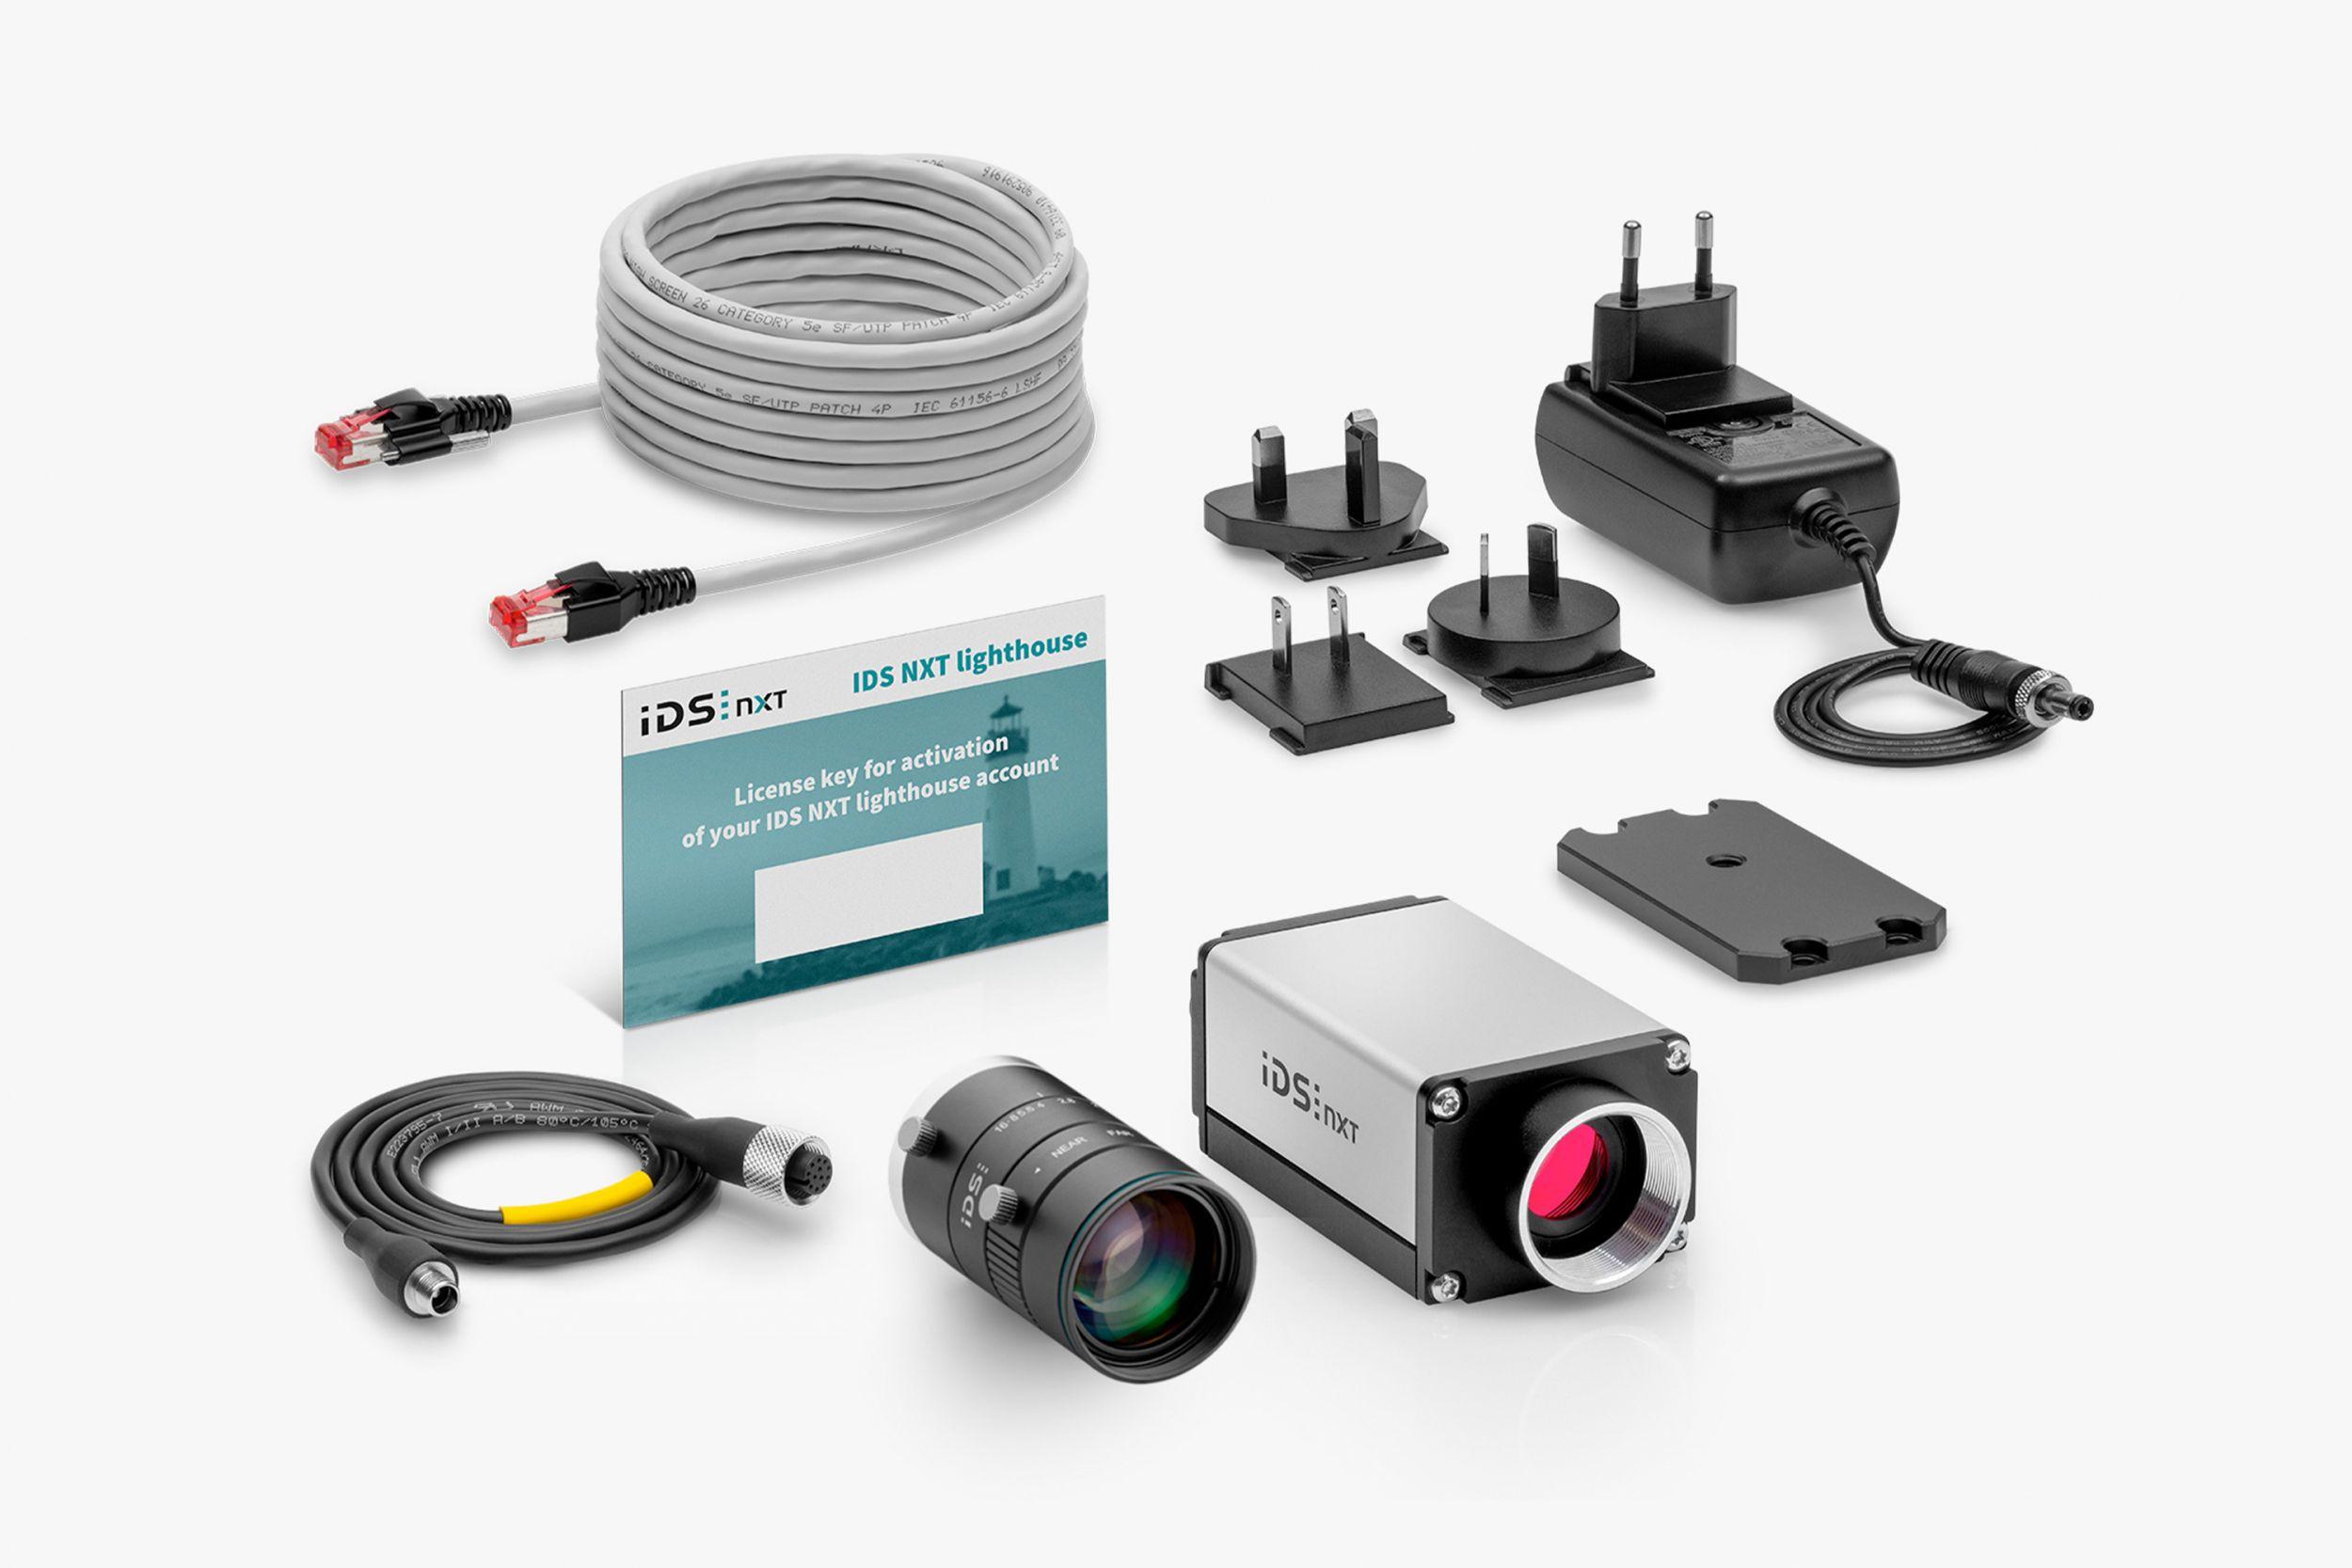 KI-Starterset mit Kamera zum Sonderpreis